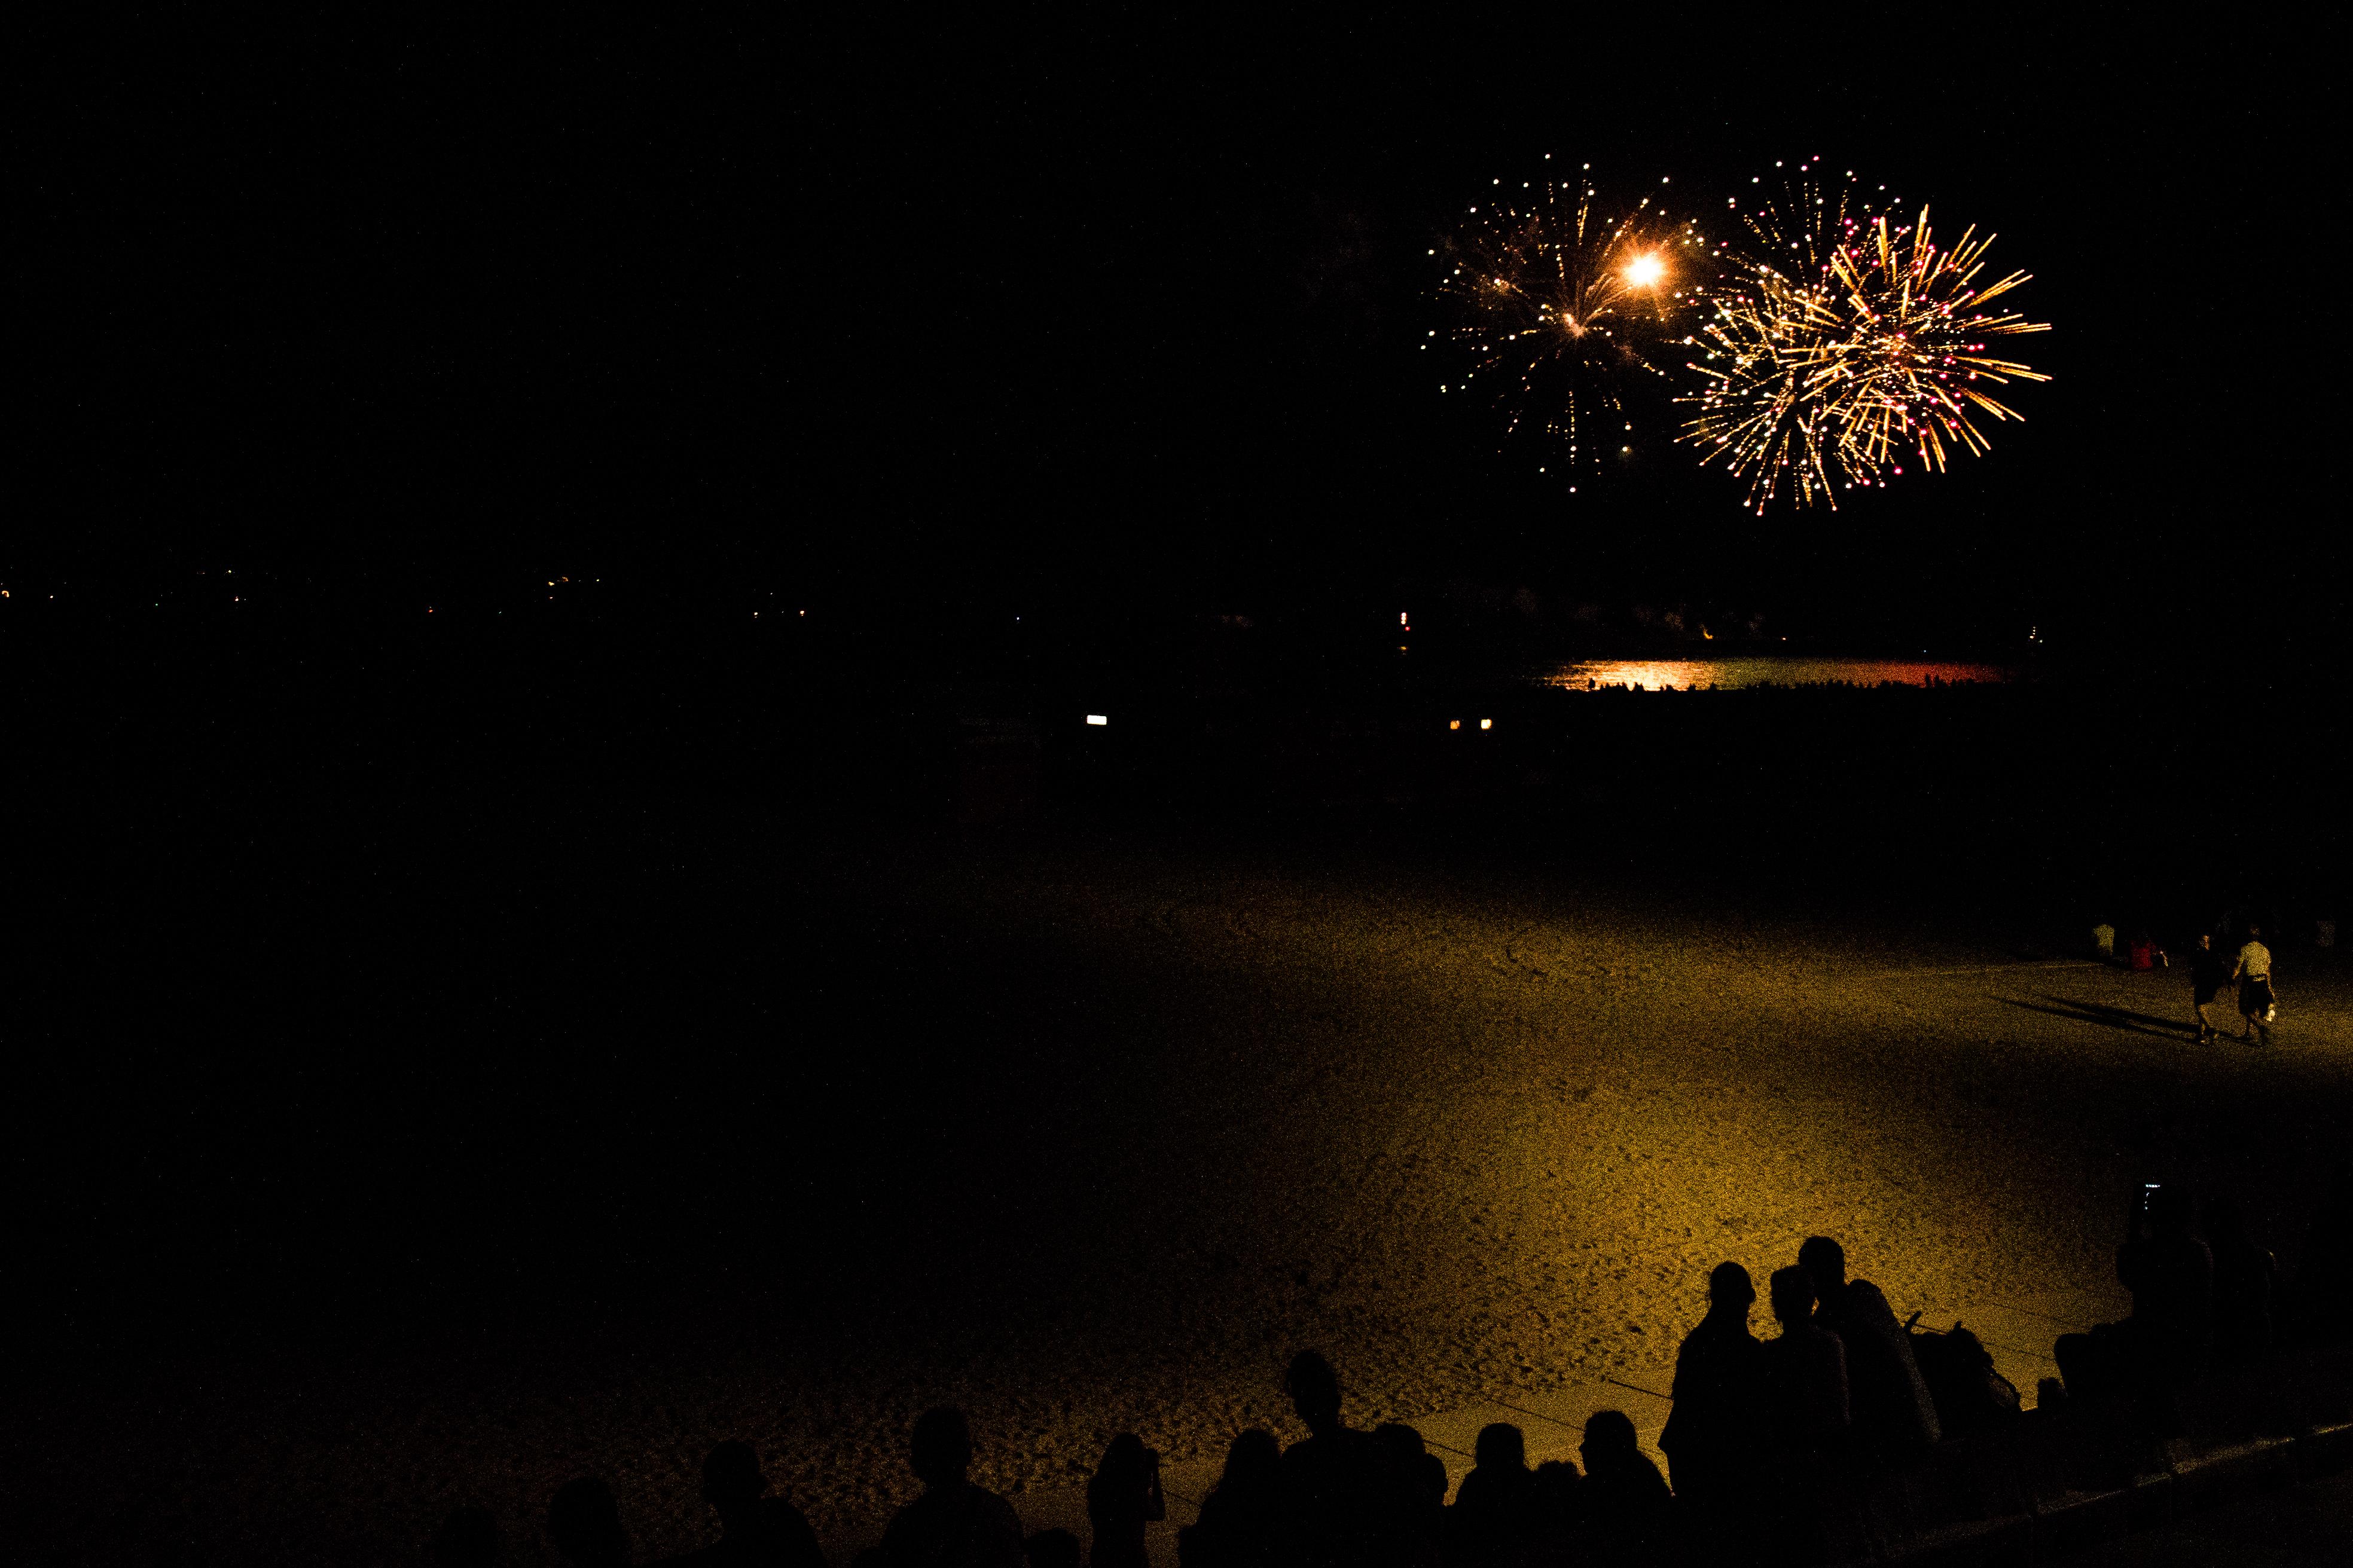 Internationaal vuurwerk festival 2013 @ scheveningen - den haag photo